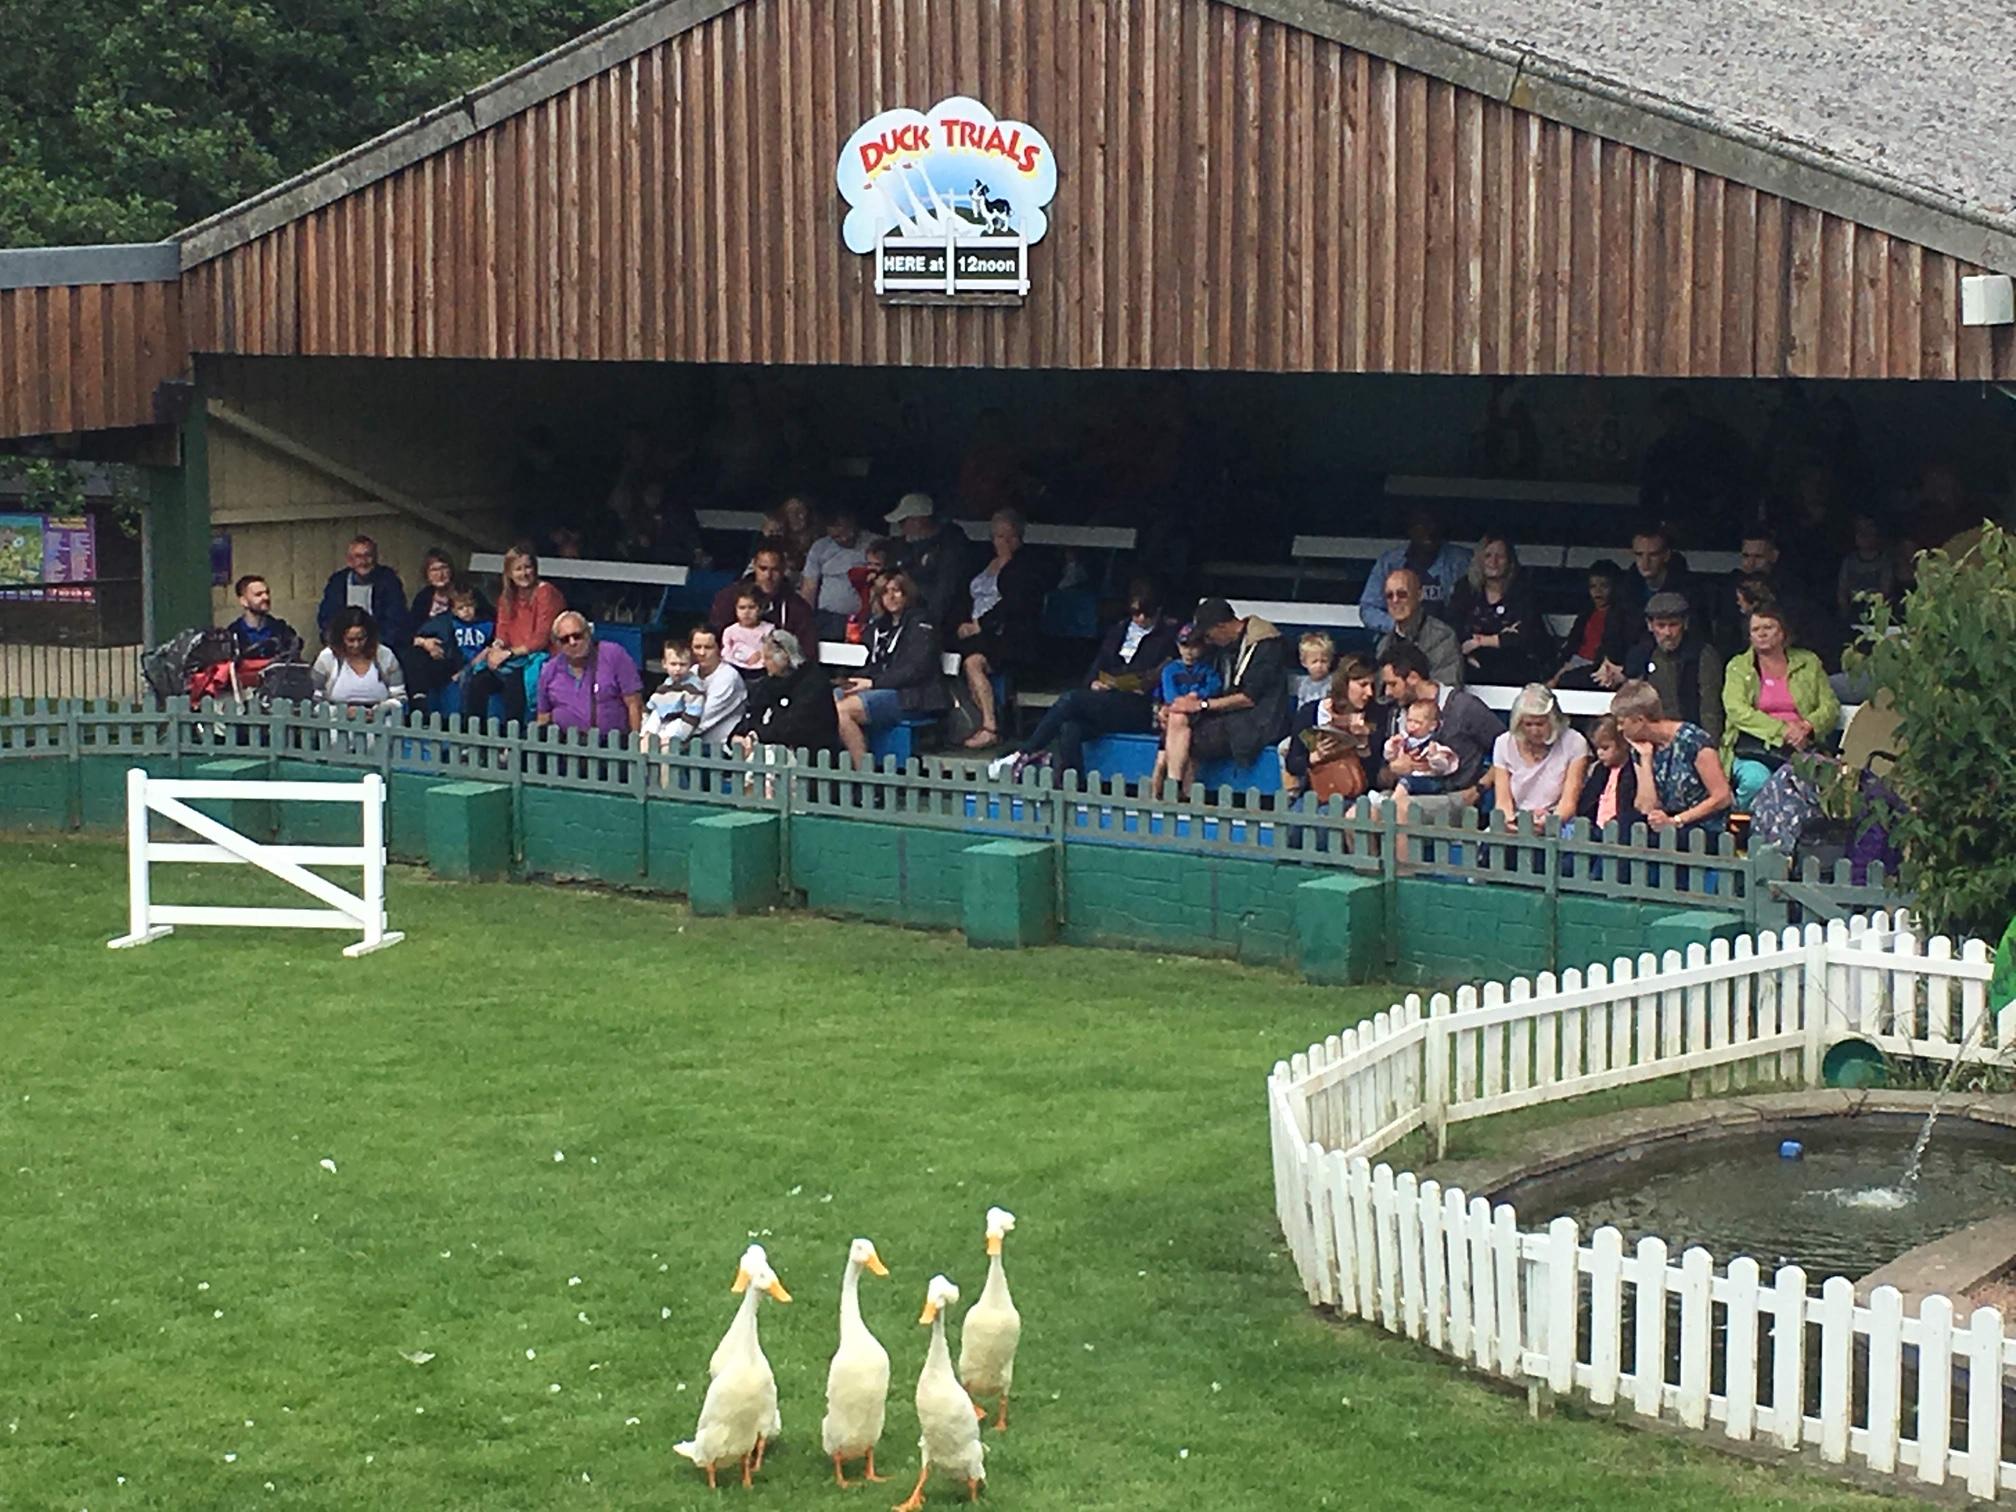 The Big Sheep in Bideford Devon